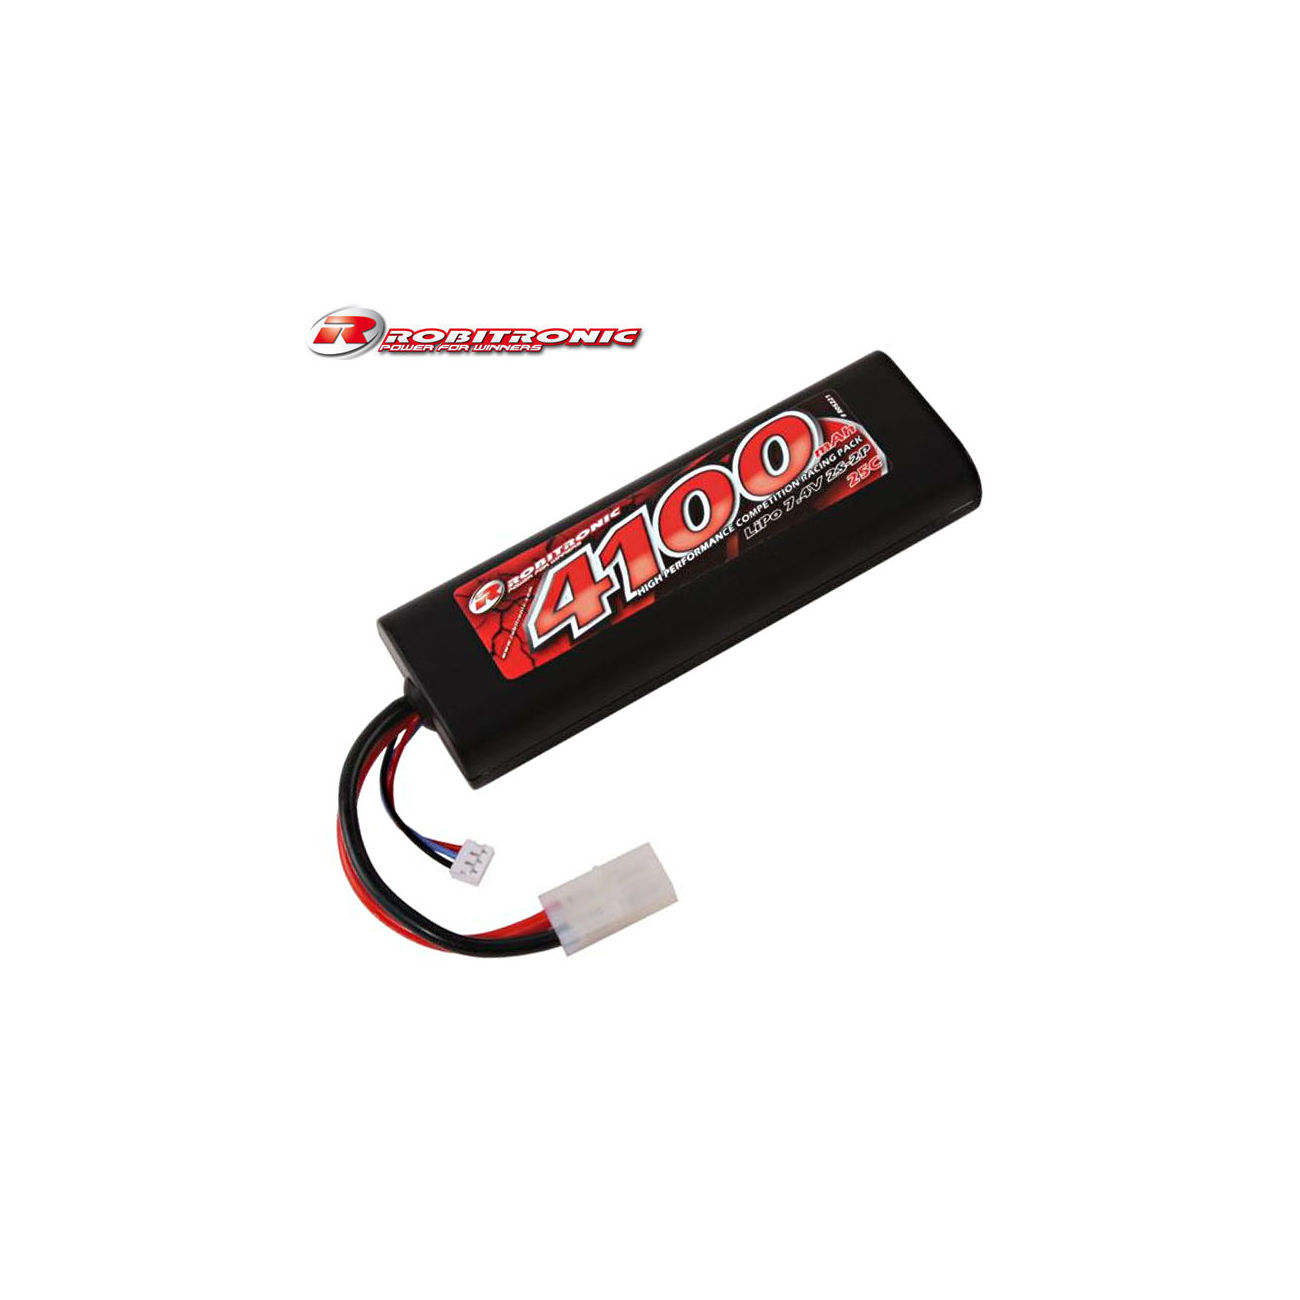 Robitronic lipo akku 7 4v 4100mah 25c racing pack kotte for Lipo schreibtisch